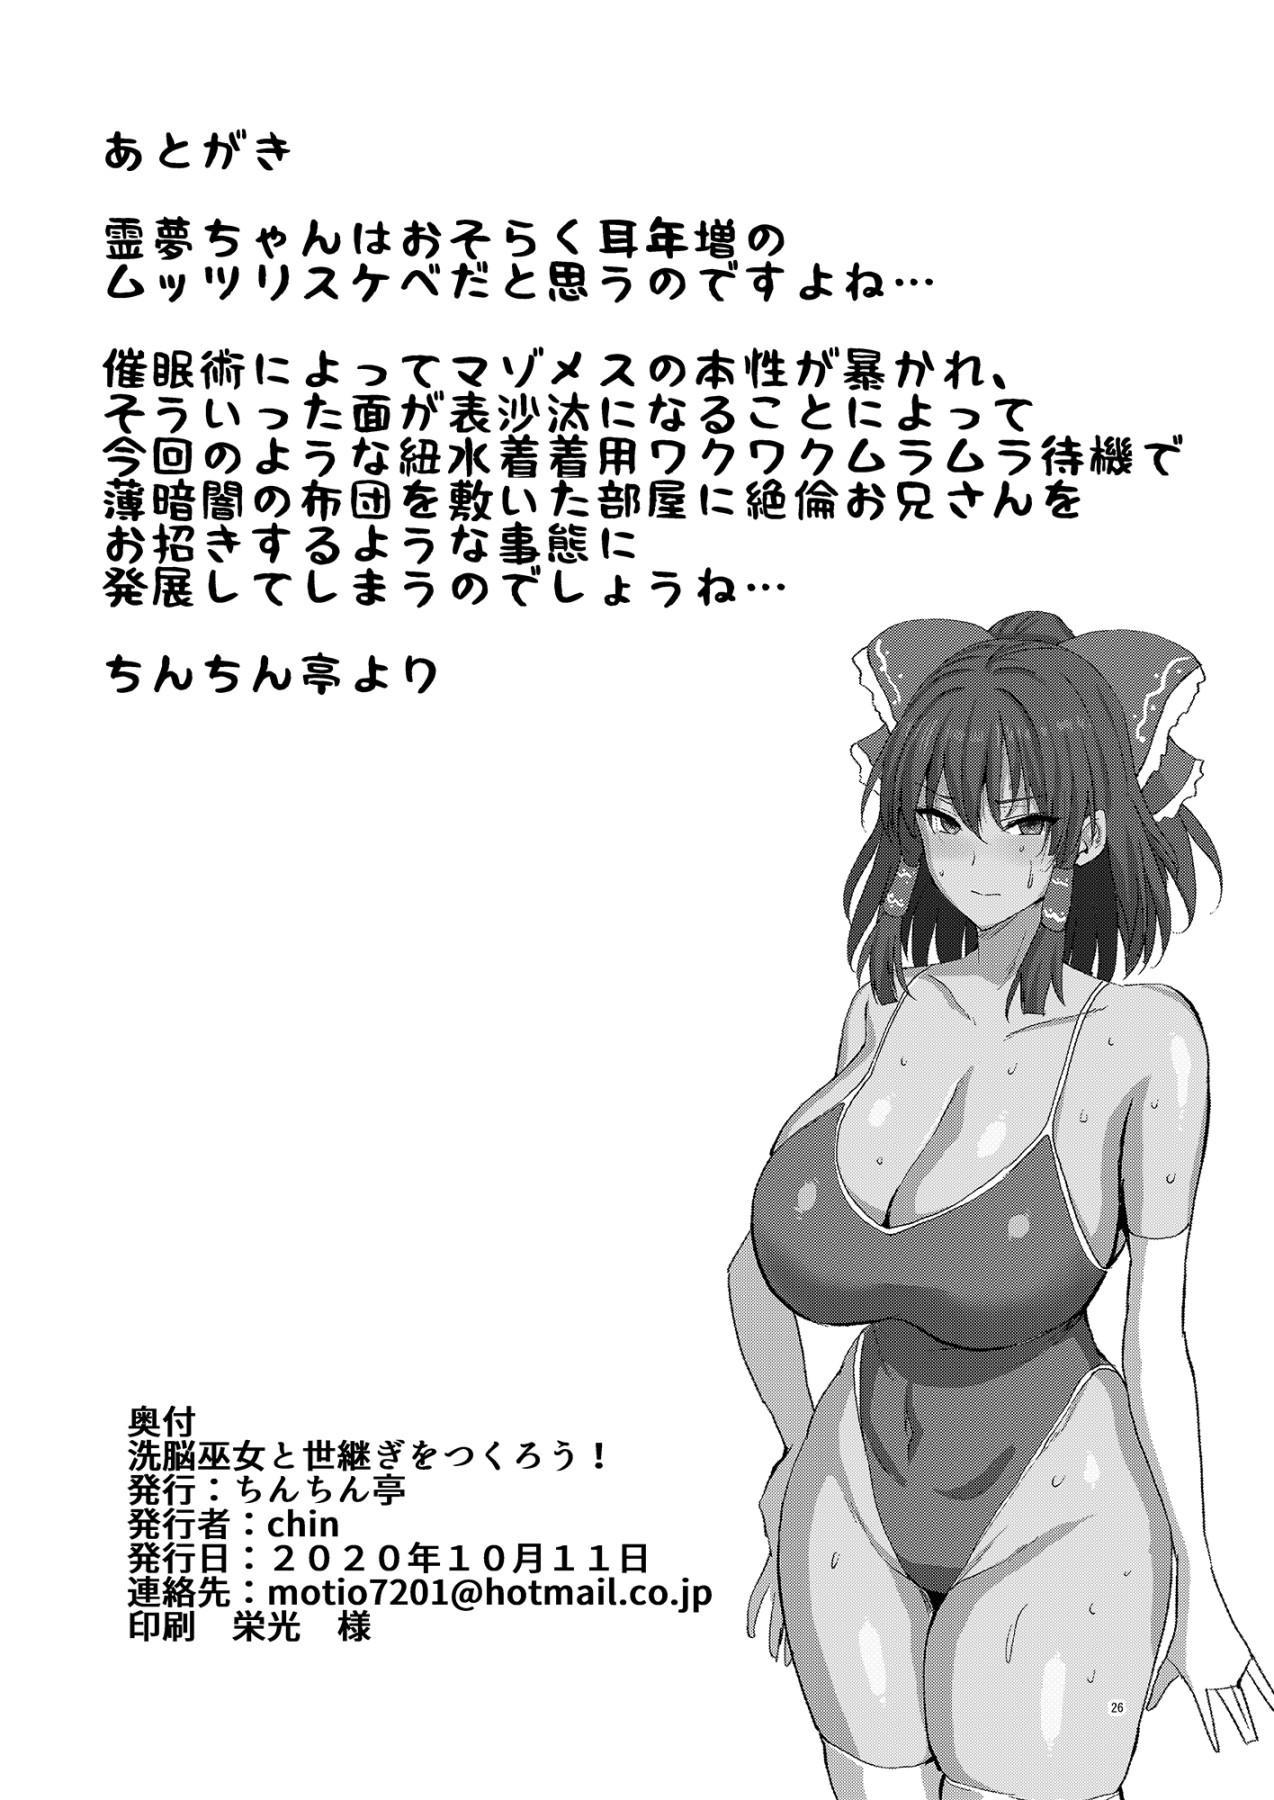 Sennou Miko to Yotsugi o Tsukurou! | Hypnotizing a Shrine Girl To Make An Heir! 26